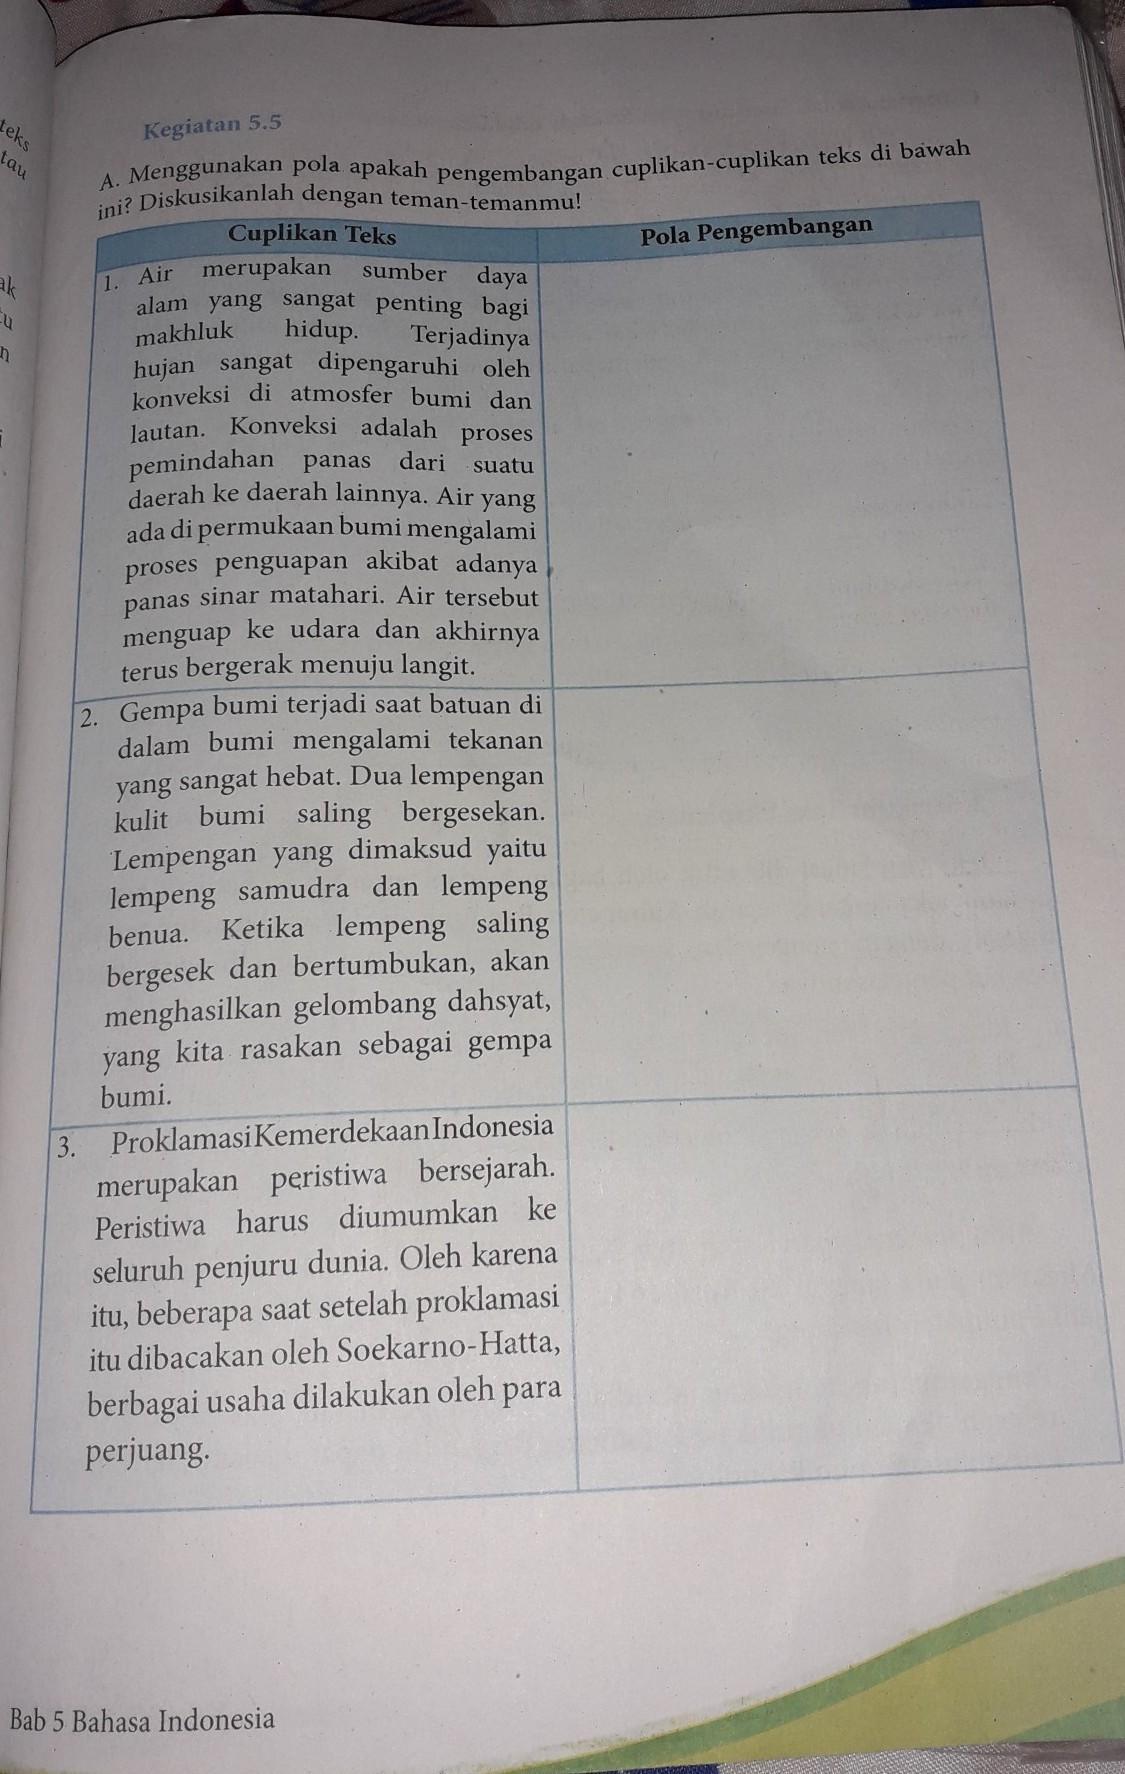 Kegiatan 5.5 Bahasa Indonesia Kelas 8 : kegiatan, bahasa, indonesia, kelas, BAHASA, INDONESIA, Kelas, Kegiatan, 137jawab, Brainly.co.id